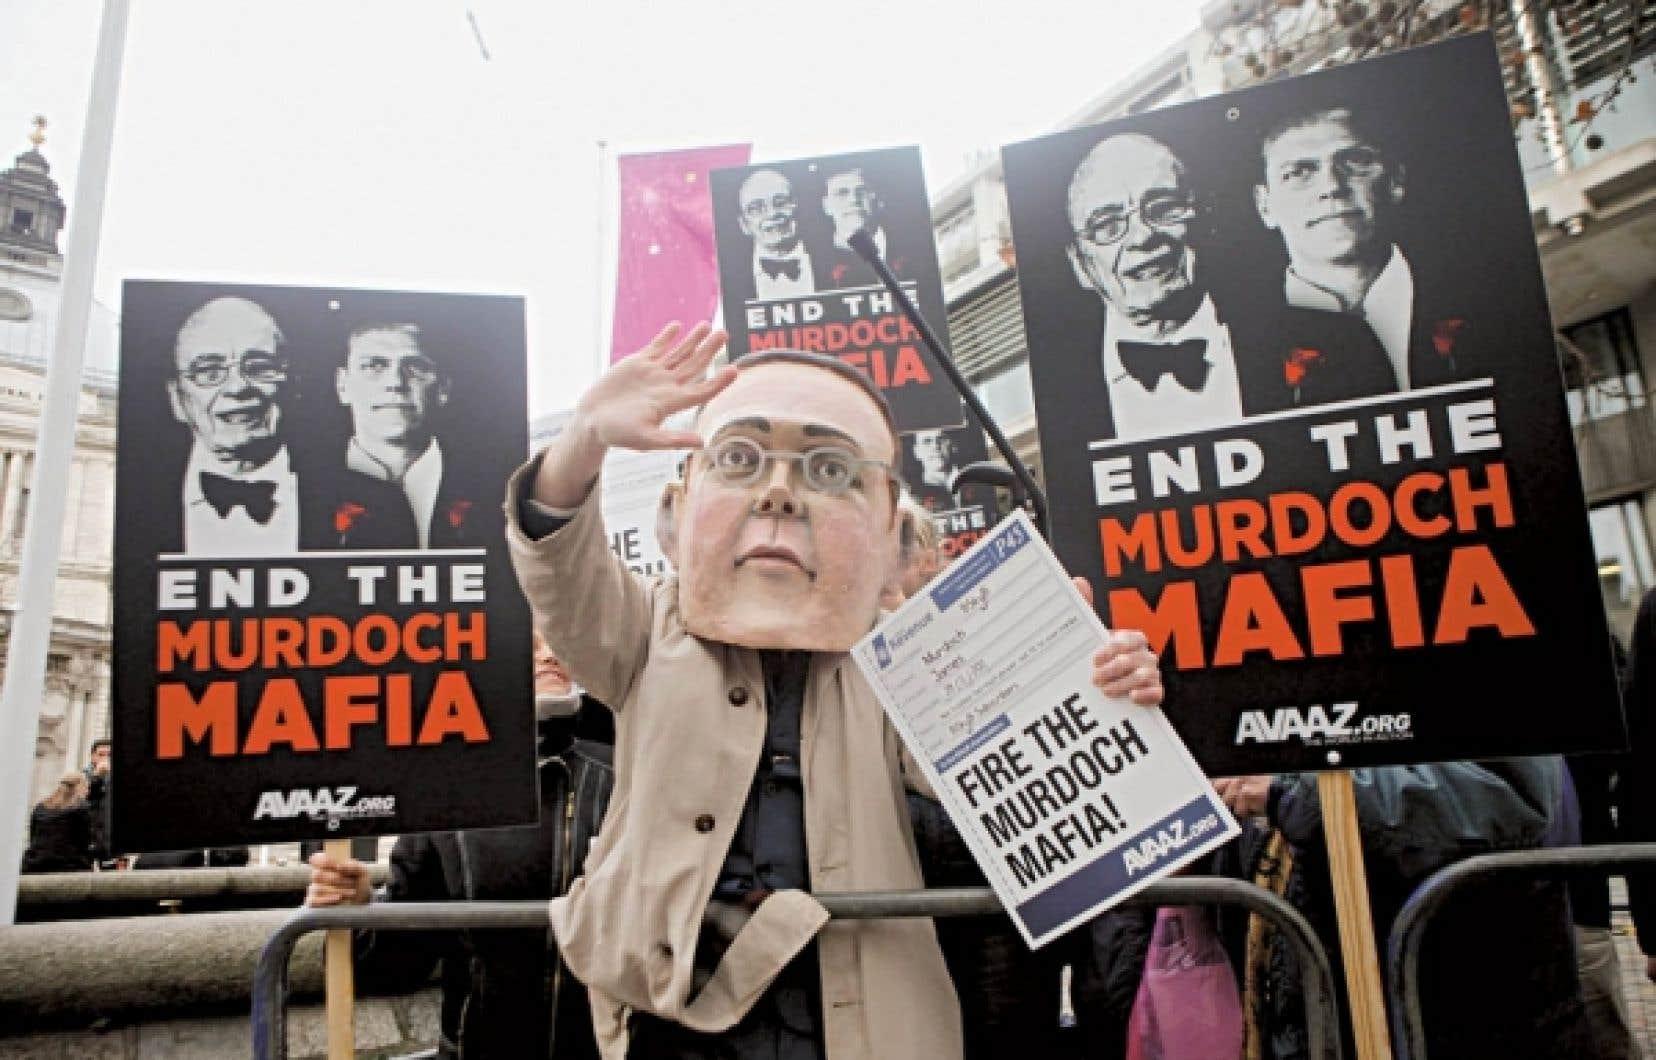 Manifestation anti-Murdoch dans les rues de Londres<br />